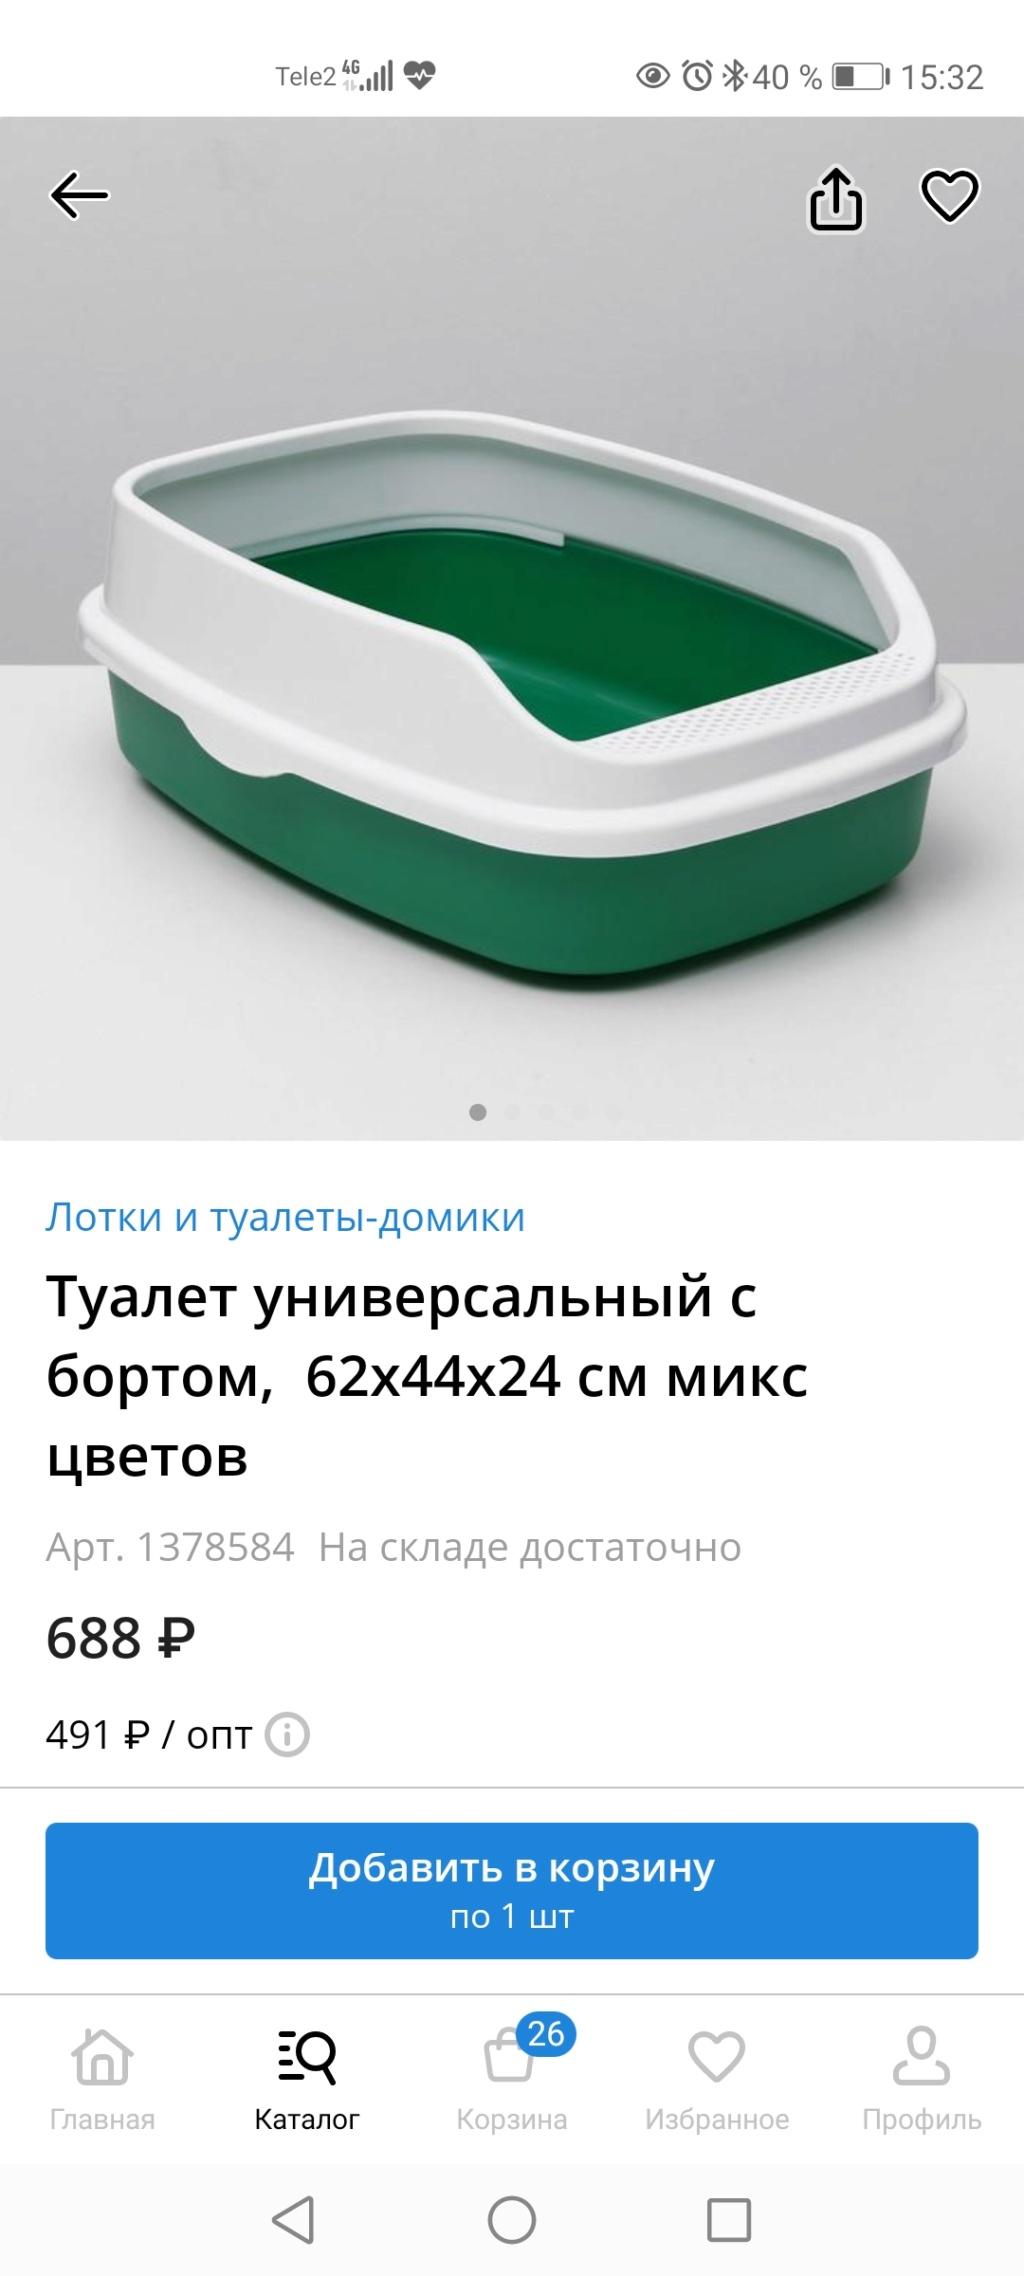 Продаю лоток-туалет для животных Screen11